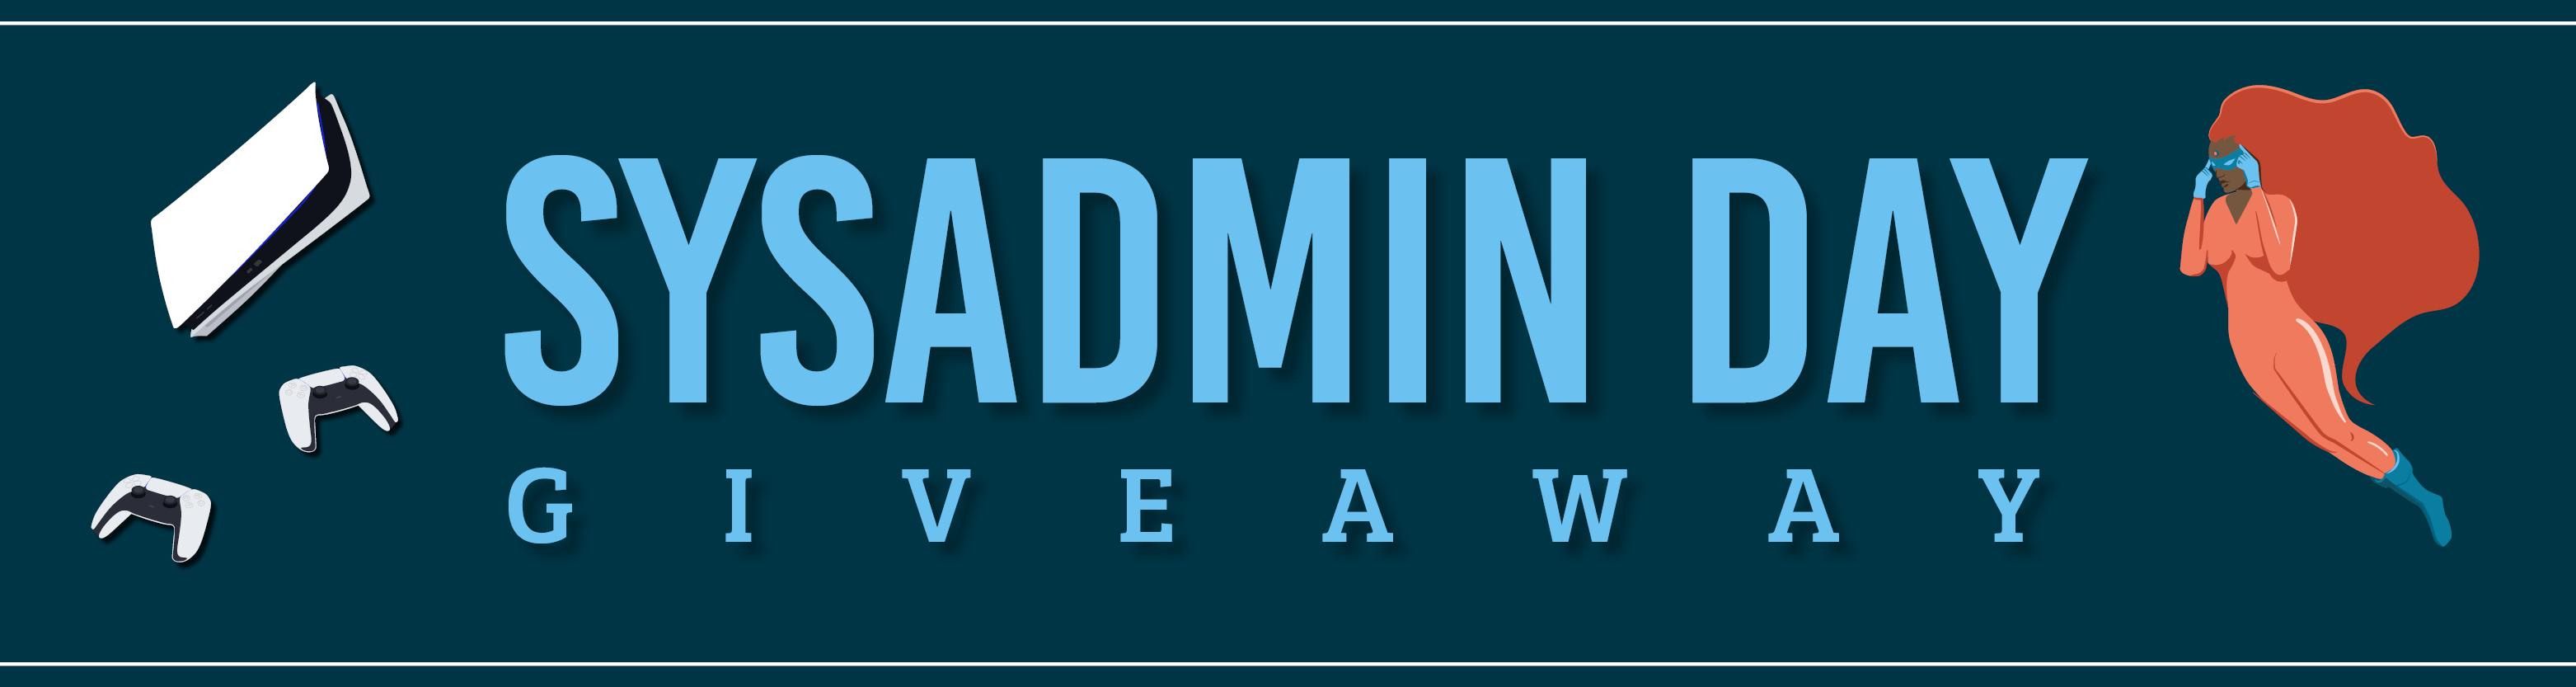 Sysadmin Giveaway Graphics - Hubspot banner